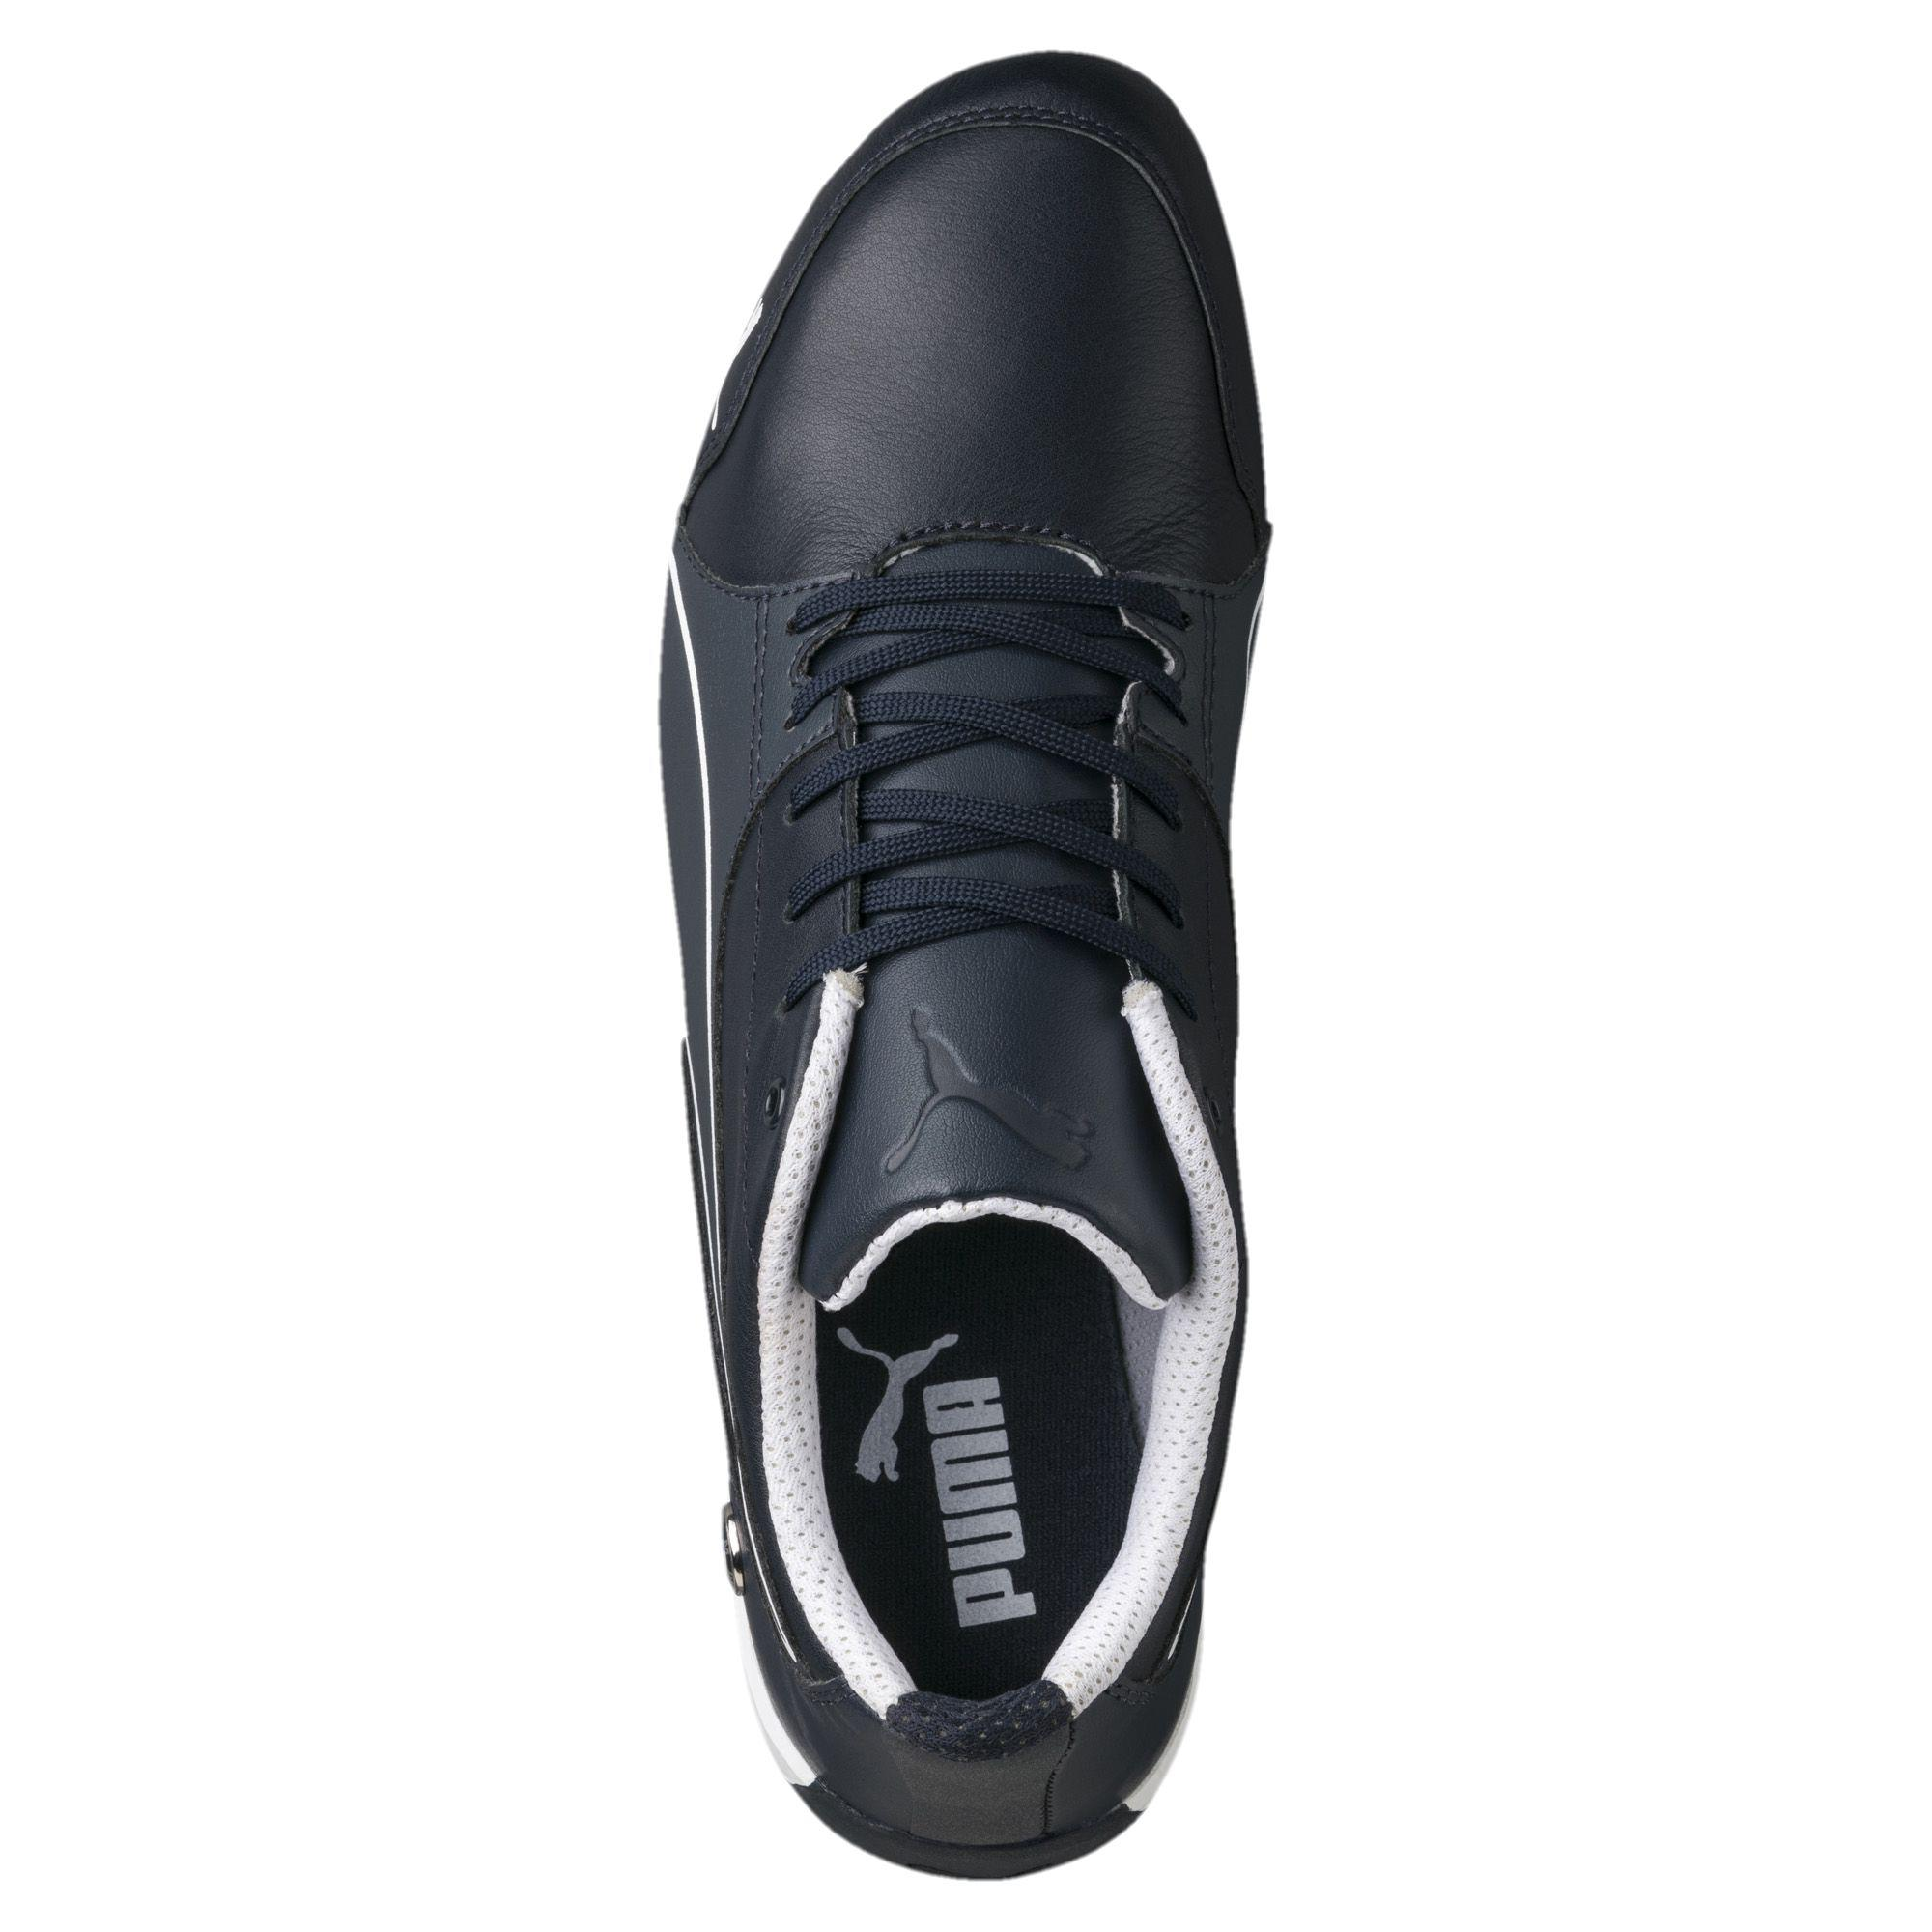 58a28faef0f9 Lyst - PUMA Bmw Motorsport Drift Cat 7 Training Shoes in Blue for Men